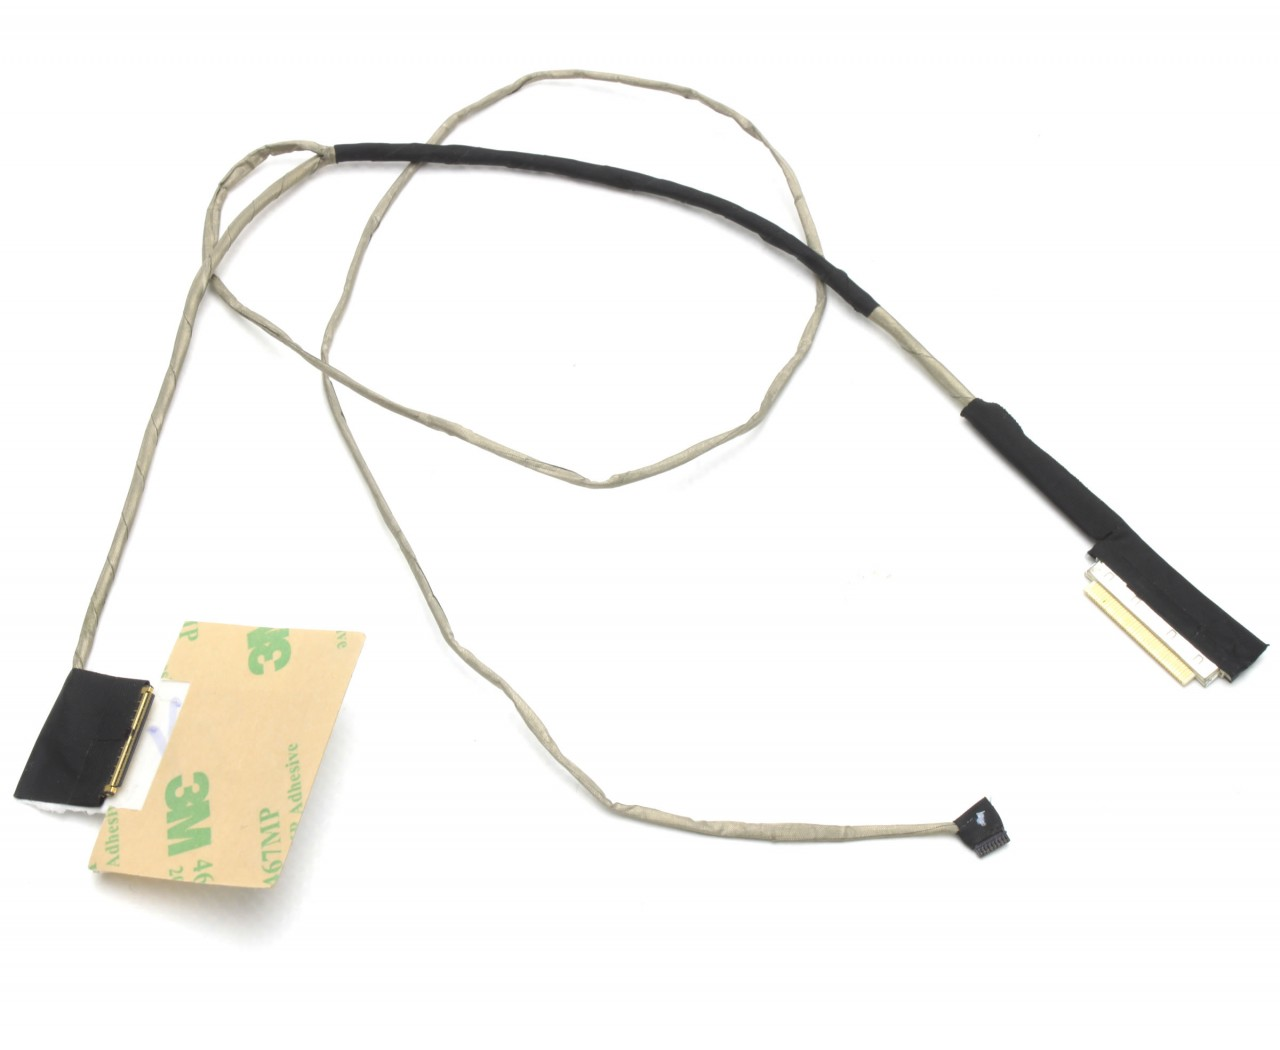 Cablu video LVDS Lenovo IdeaPad 100 15IBD Full HD imagine powerlaptop.ro 2021